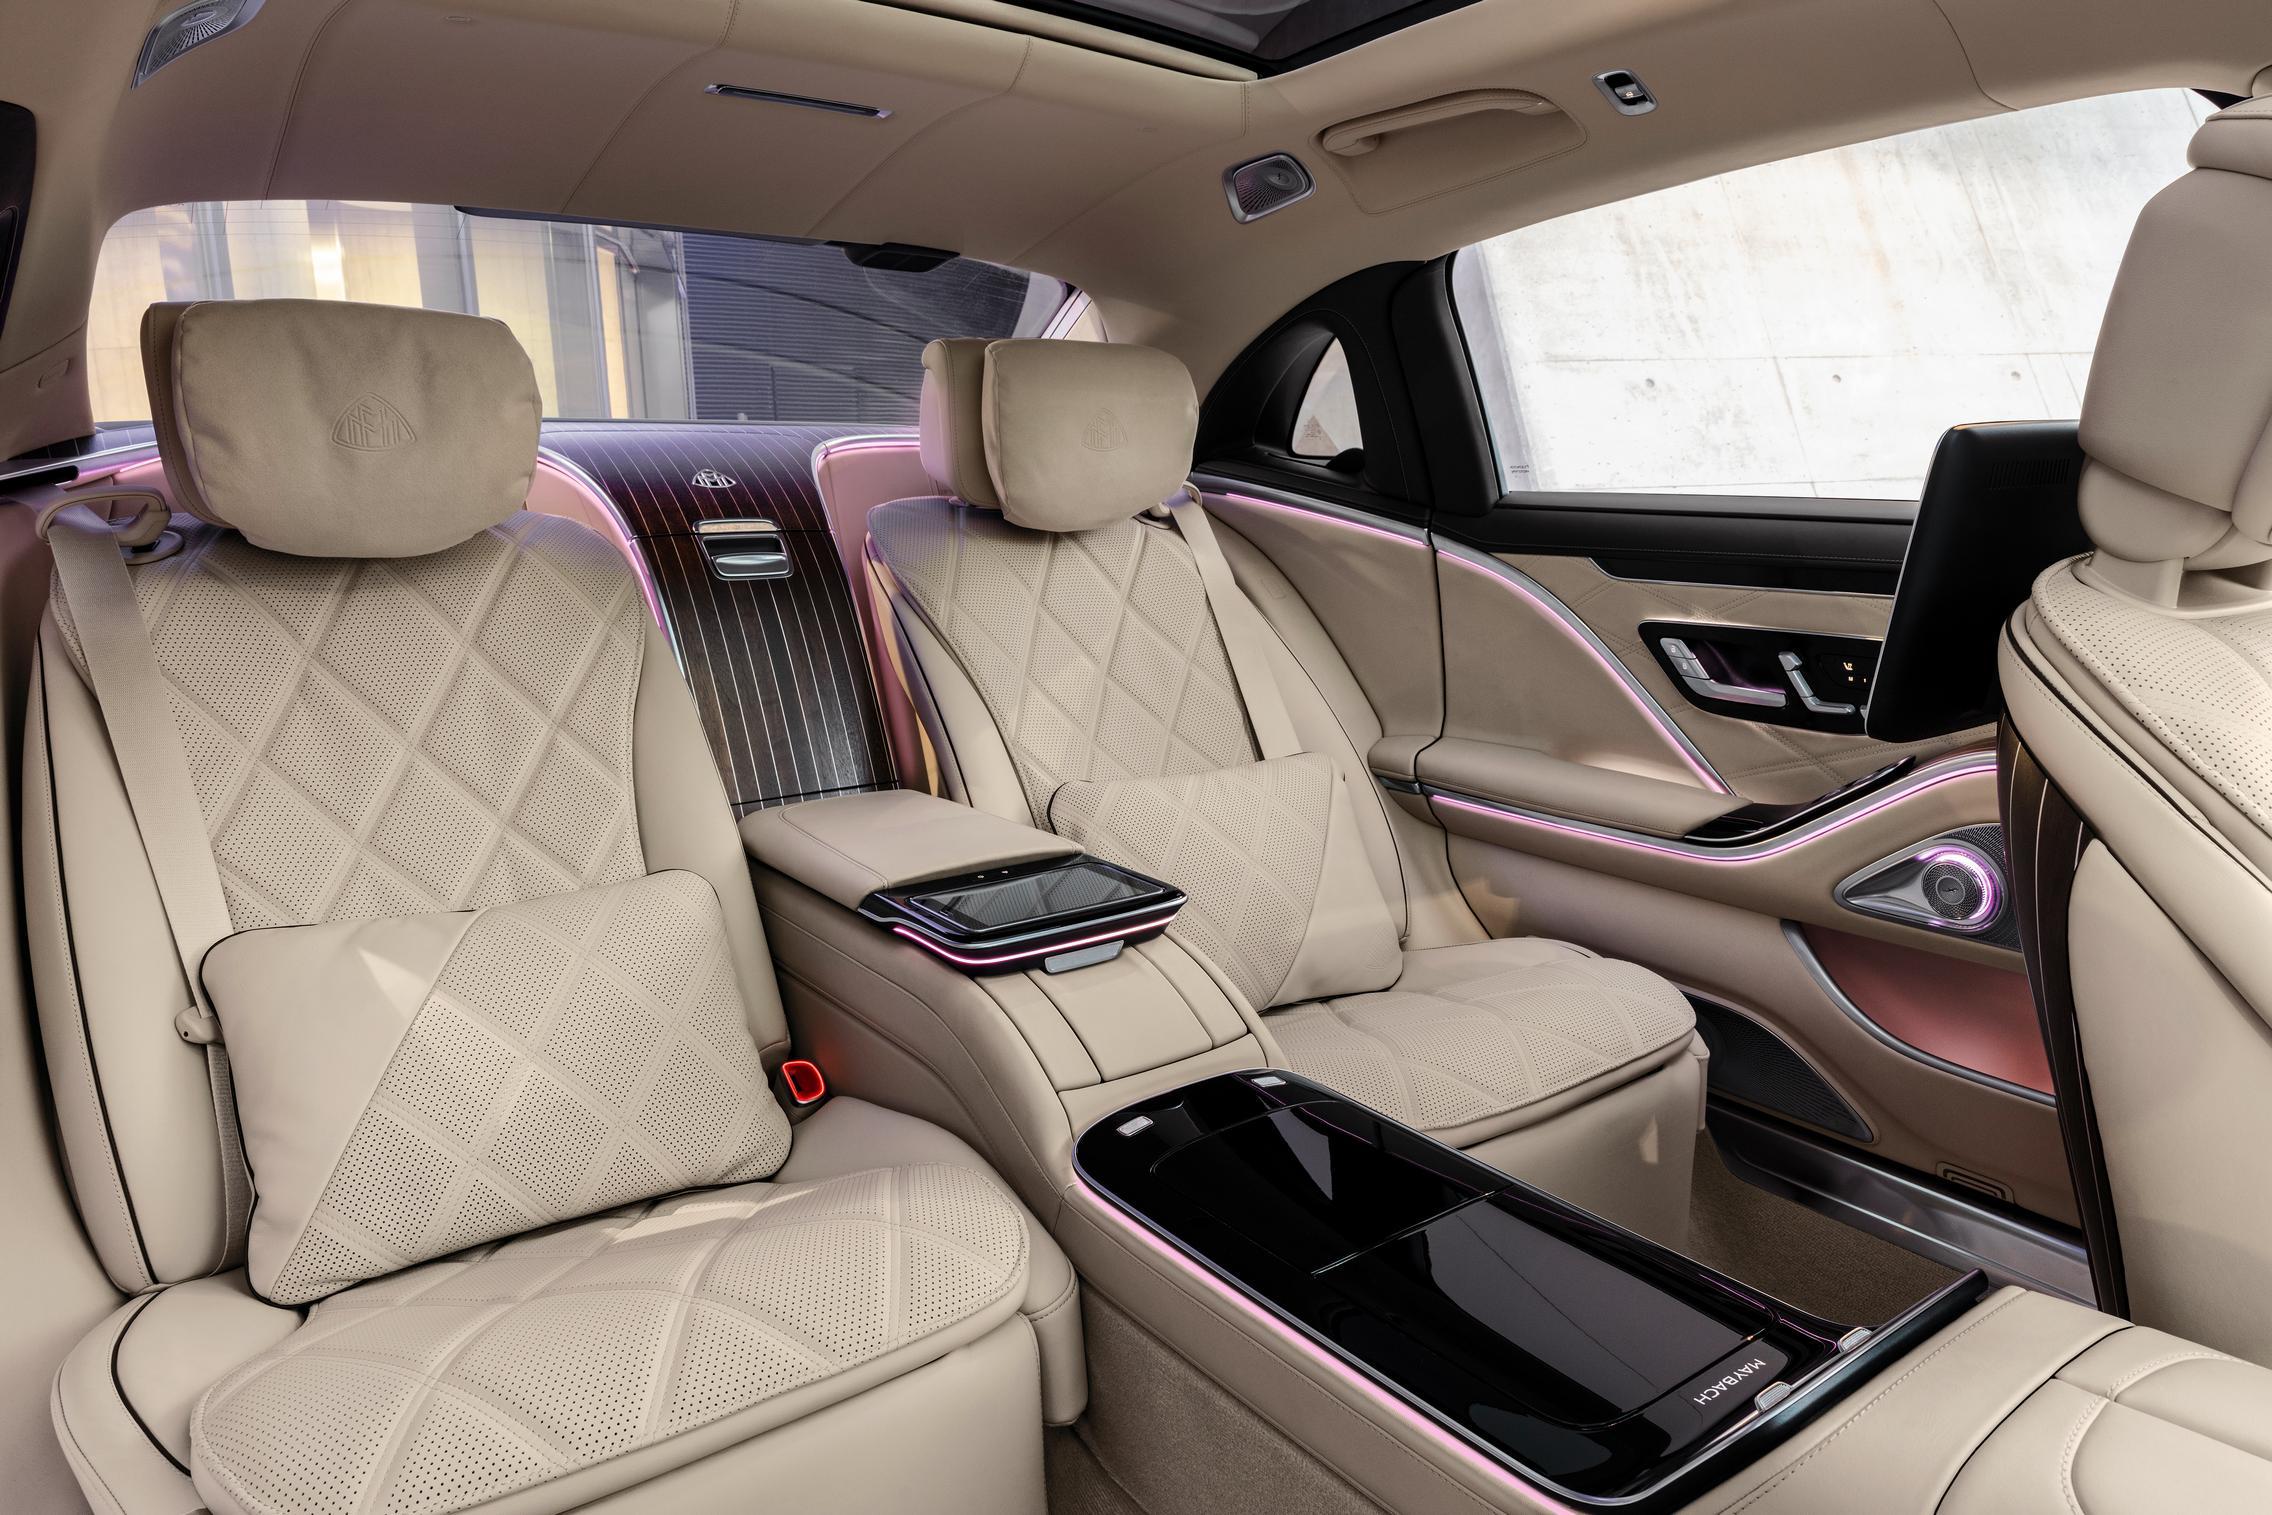 2021 Mercedes-Maybach S-Class Rear Seats